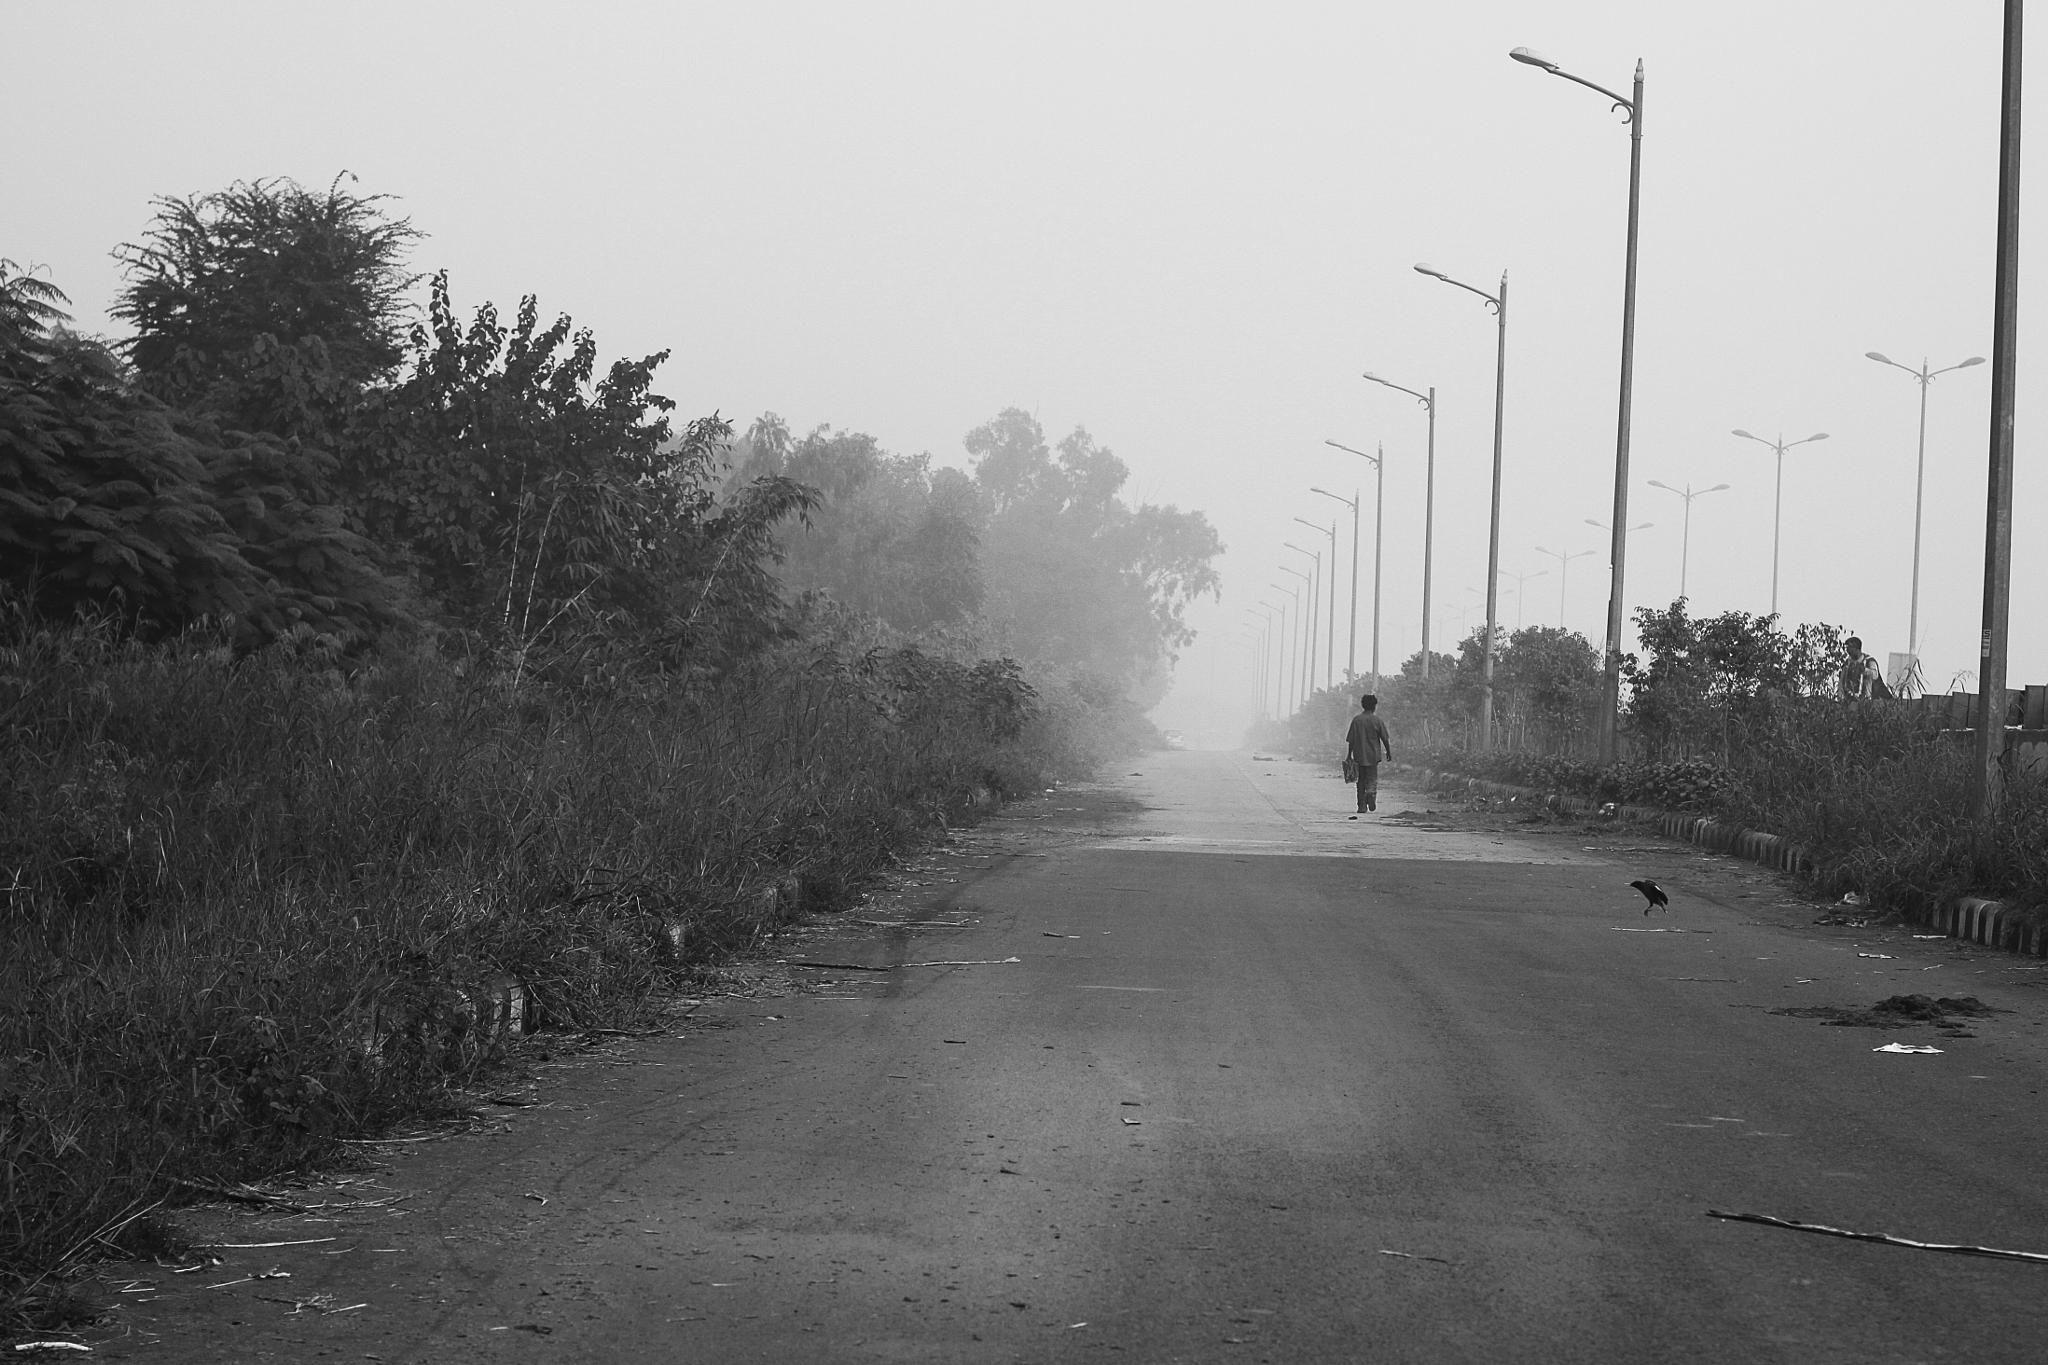 Delhi - India by am.lester